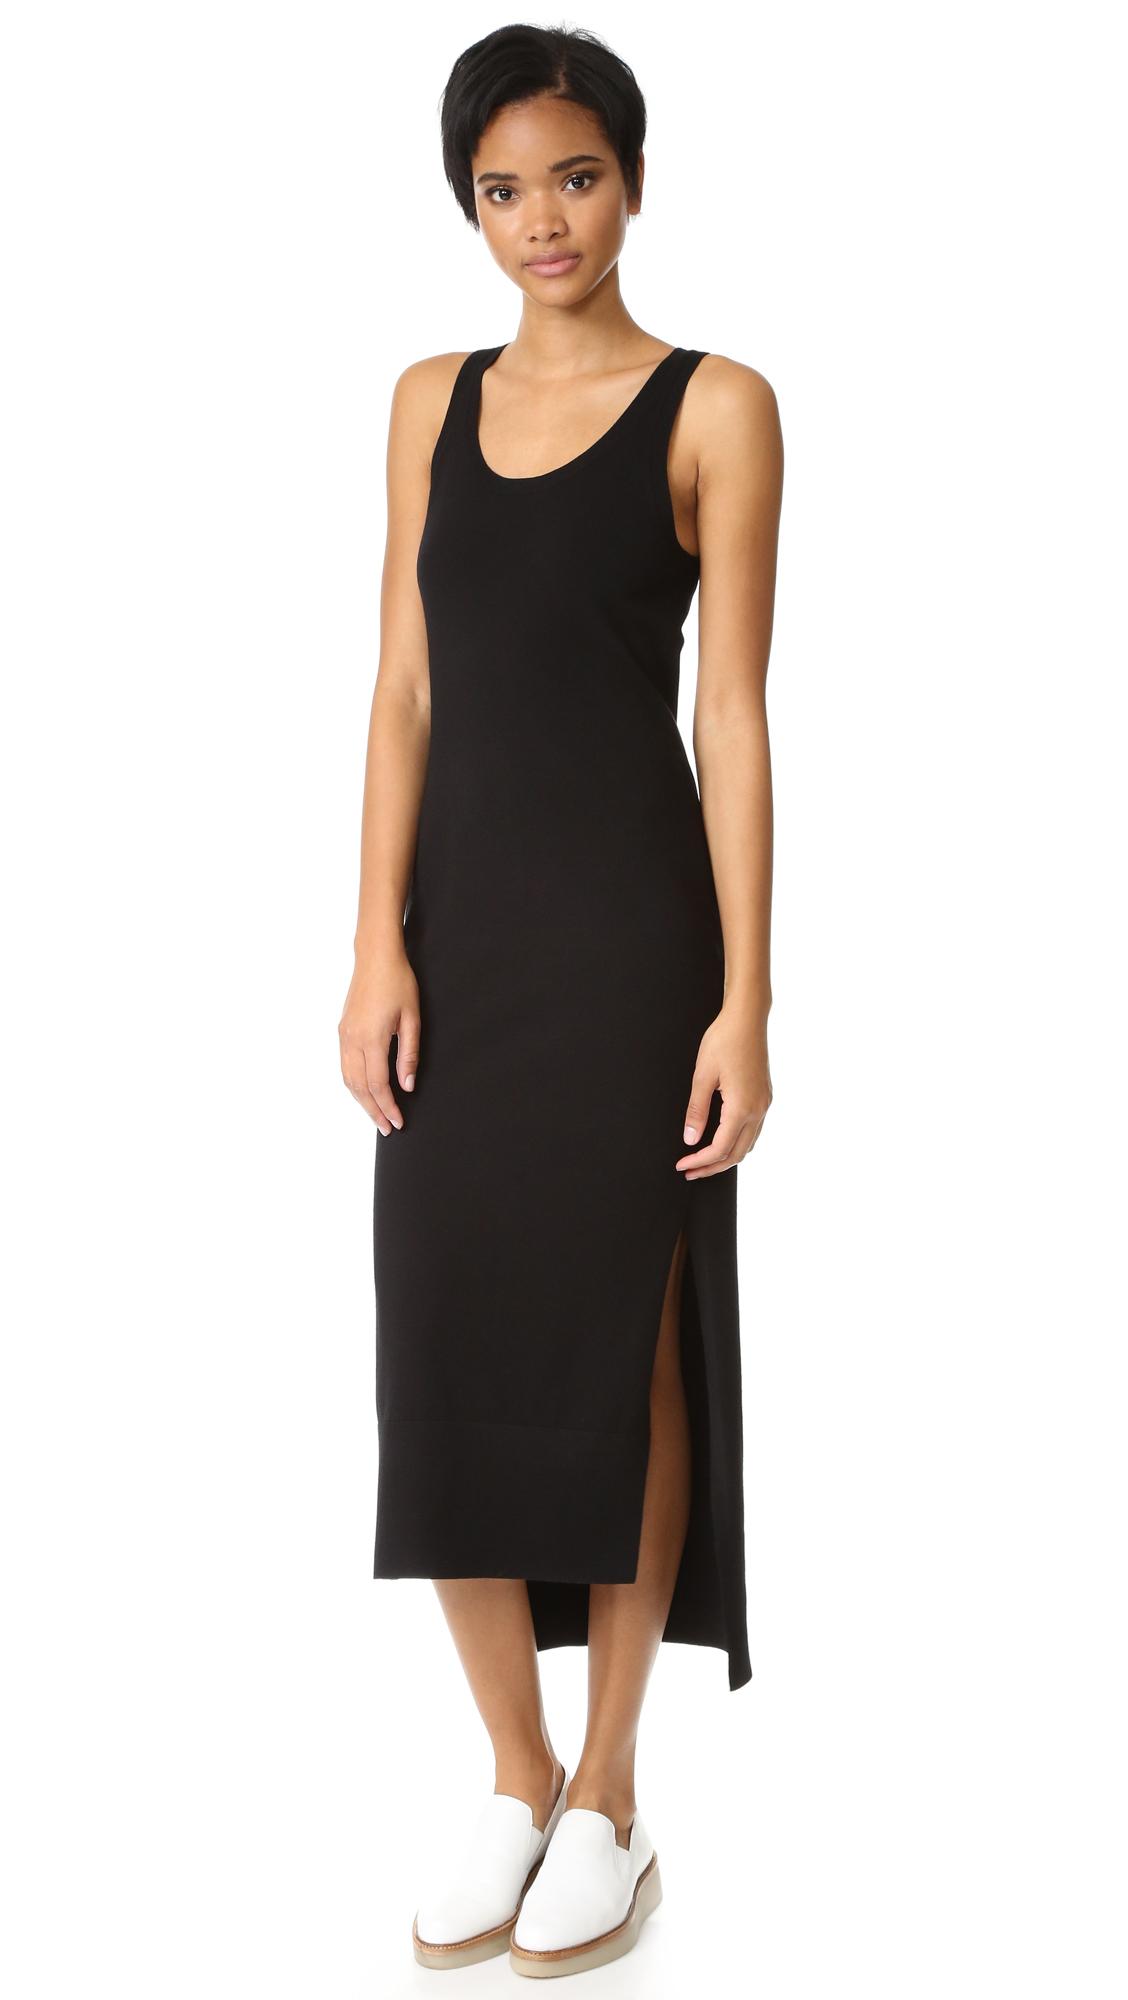 Dkny Sleeveless Dress With Side Slits - Black at Shopbop